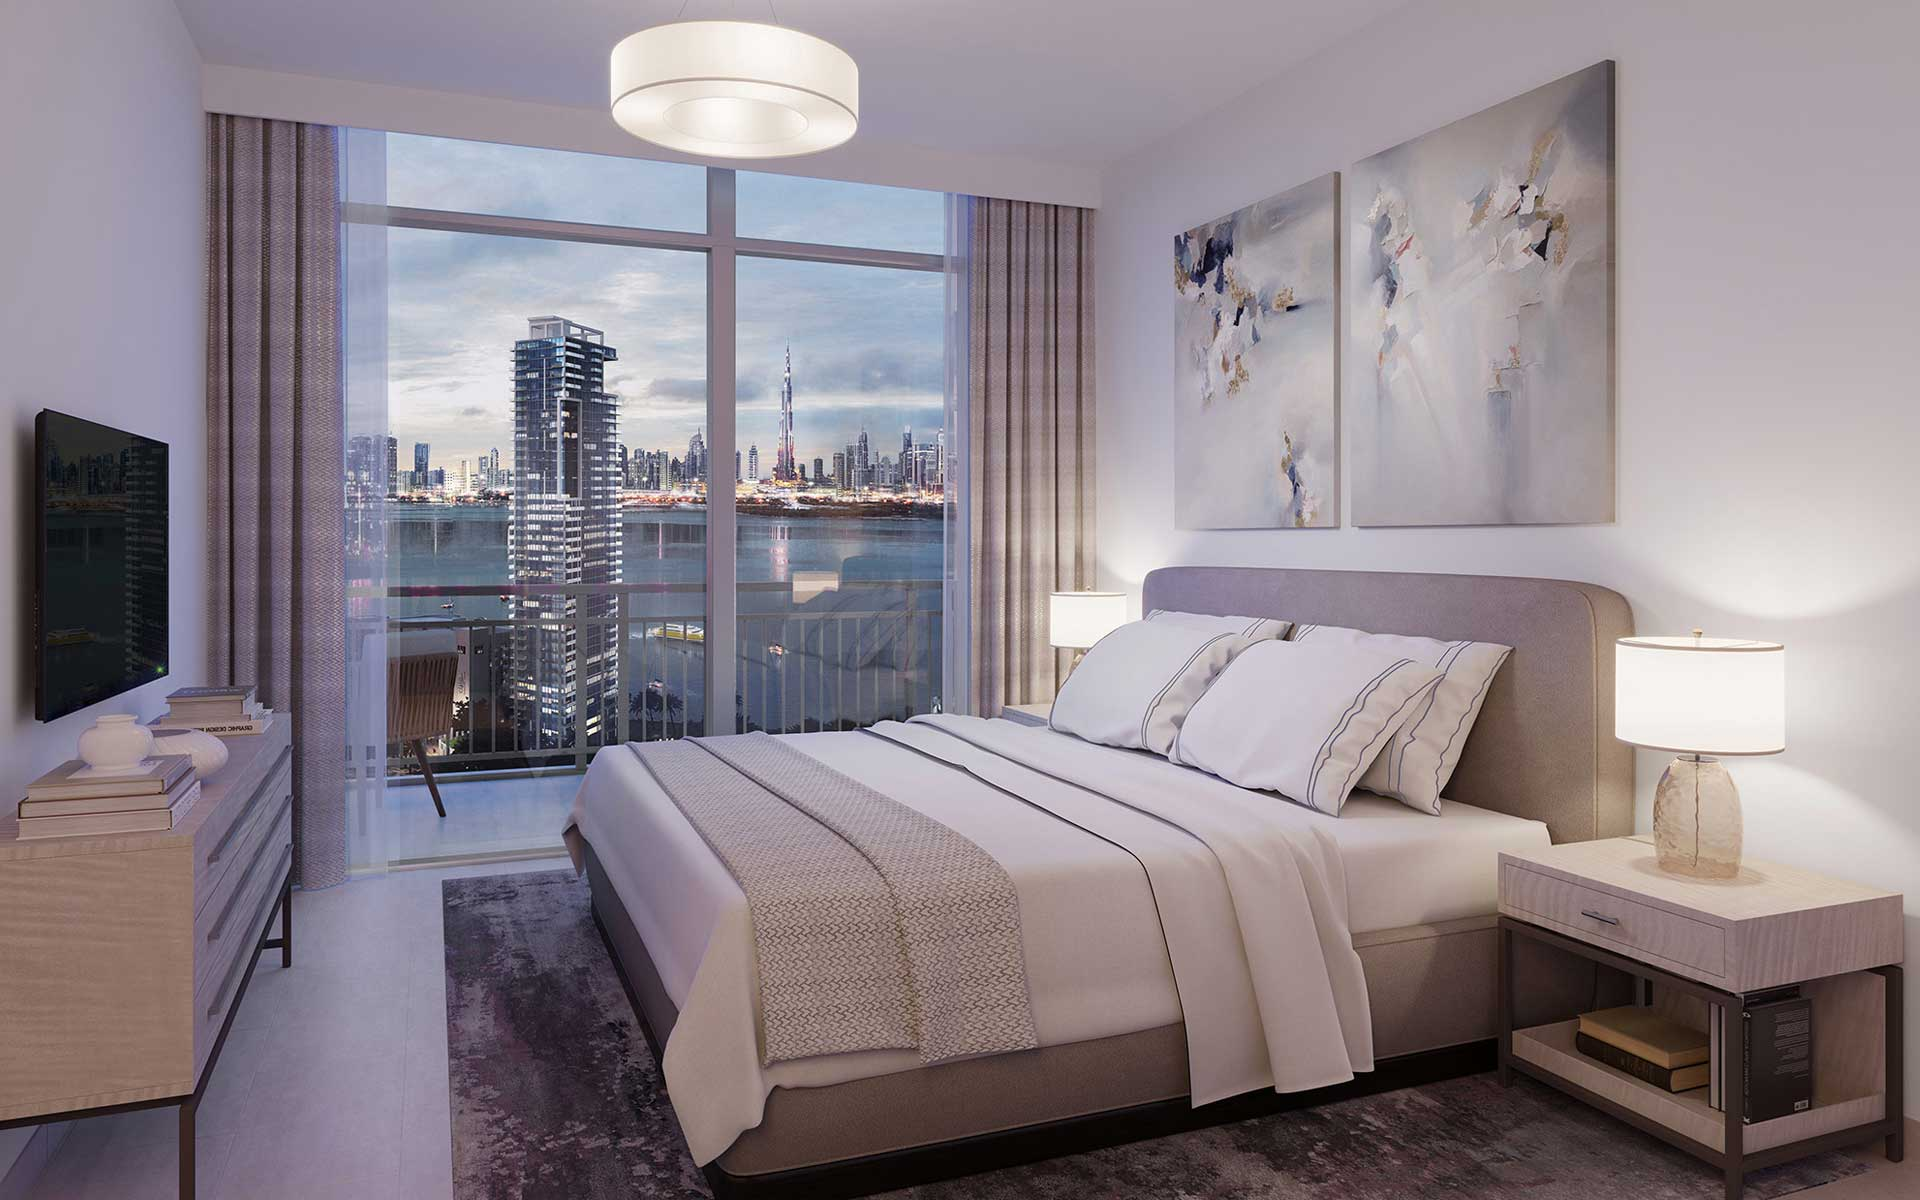 2-bedroom-with-2-balconies-in-creek-rise